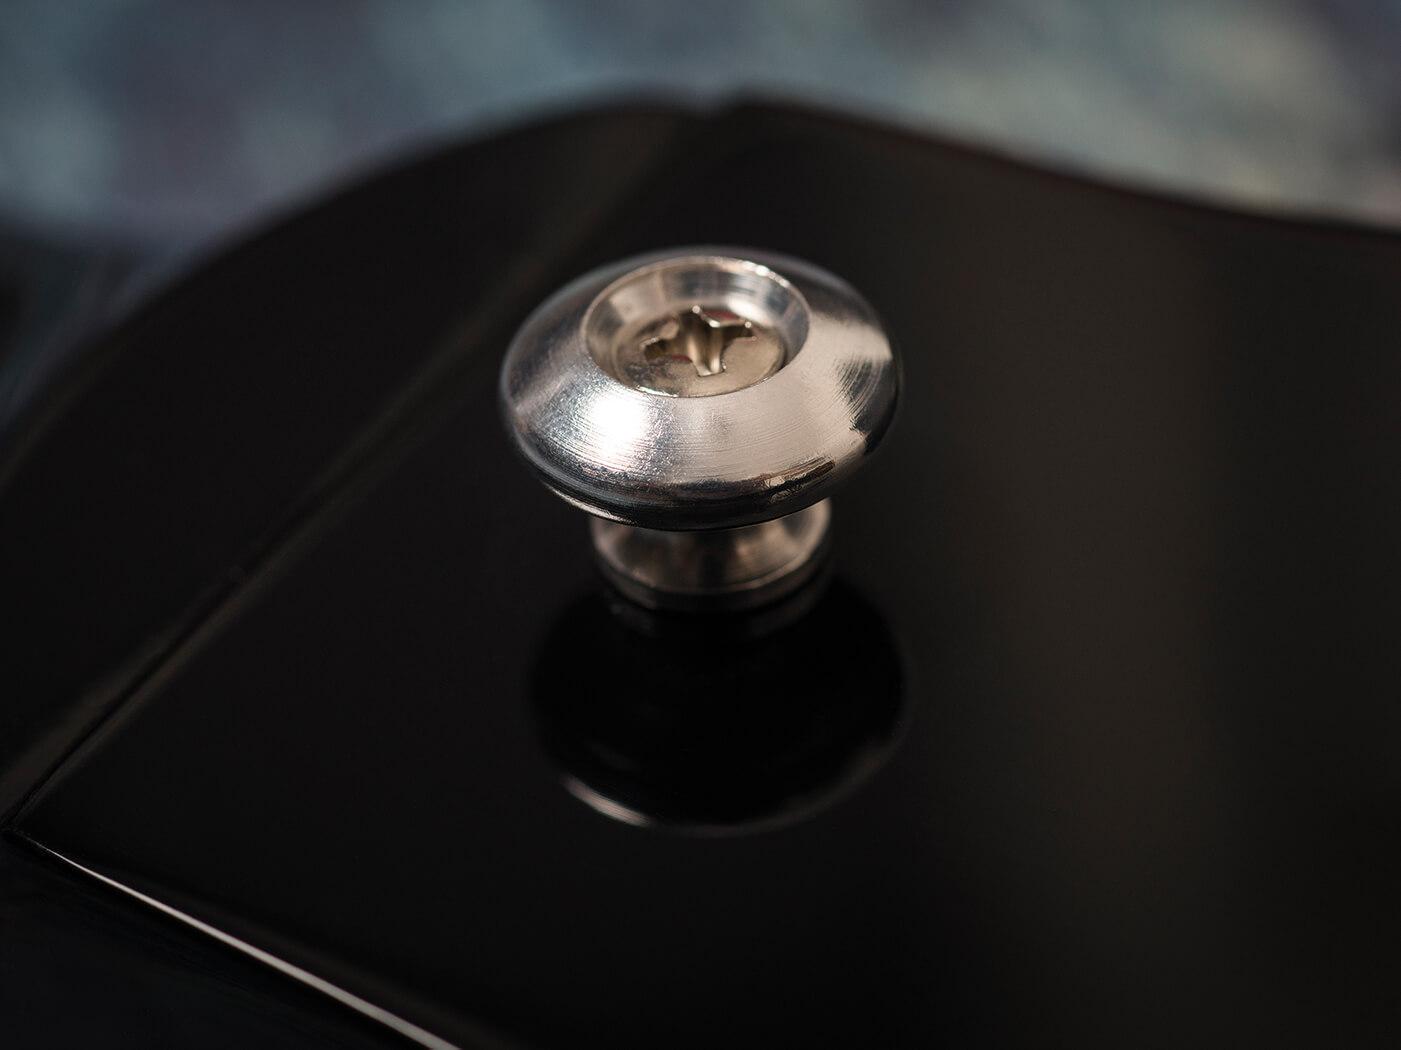 Gibson 2019 SG Standard pin button